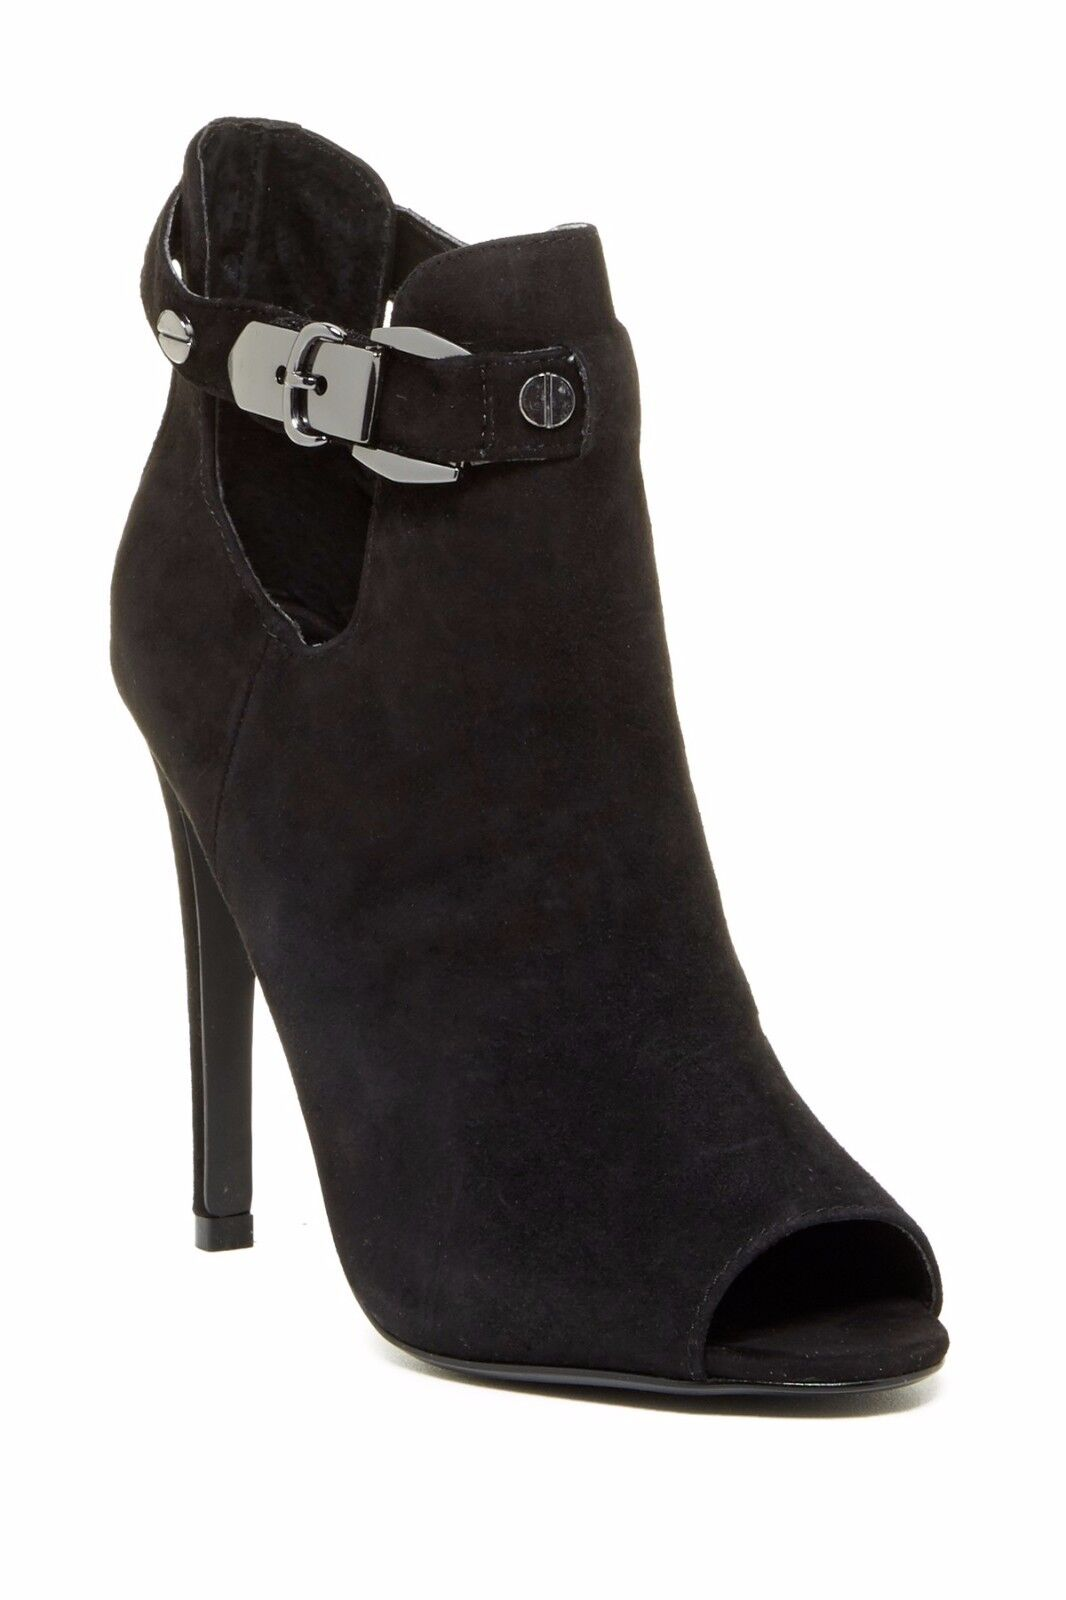 New Steve Madden Daisia Open Toe Booties women's size 10